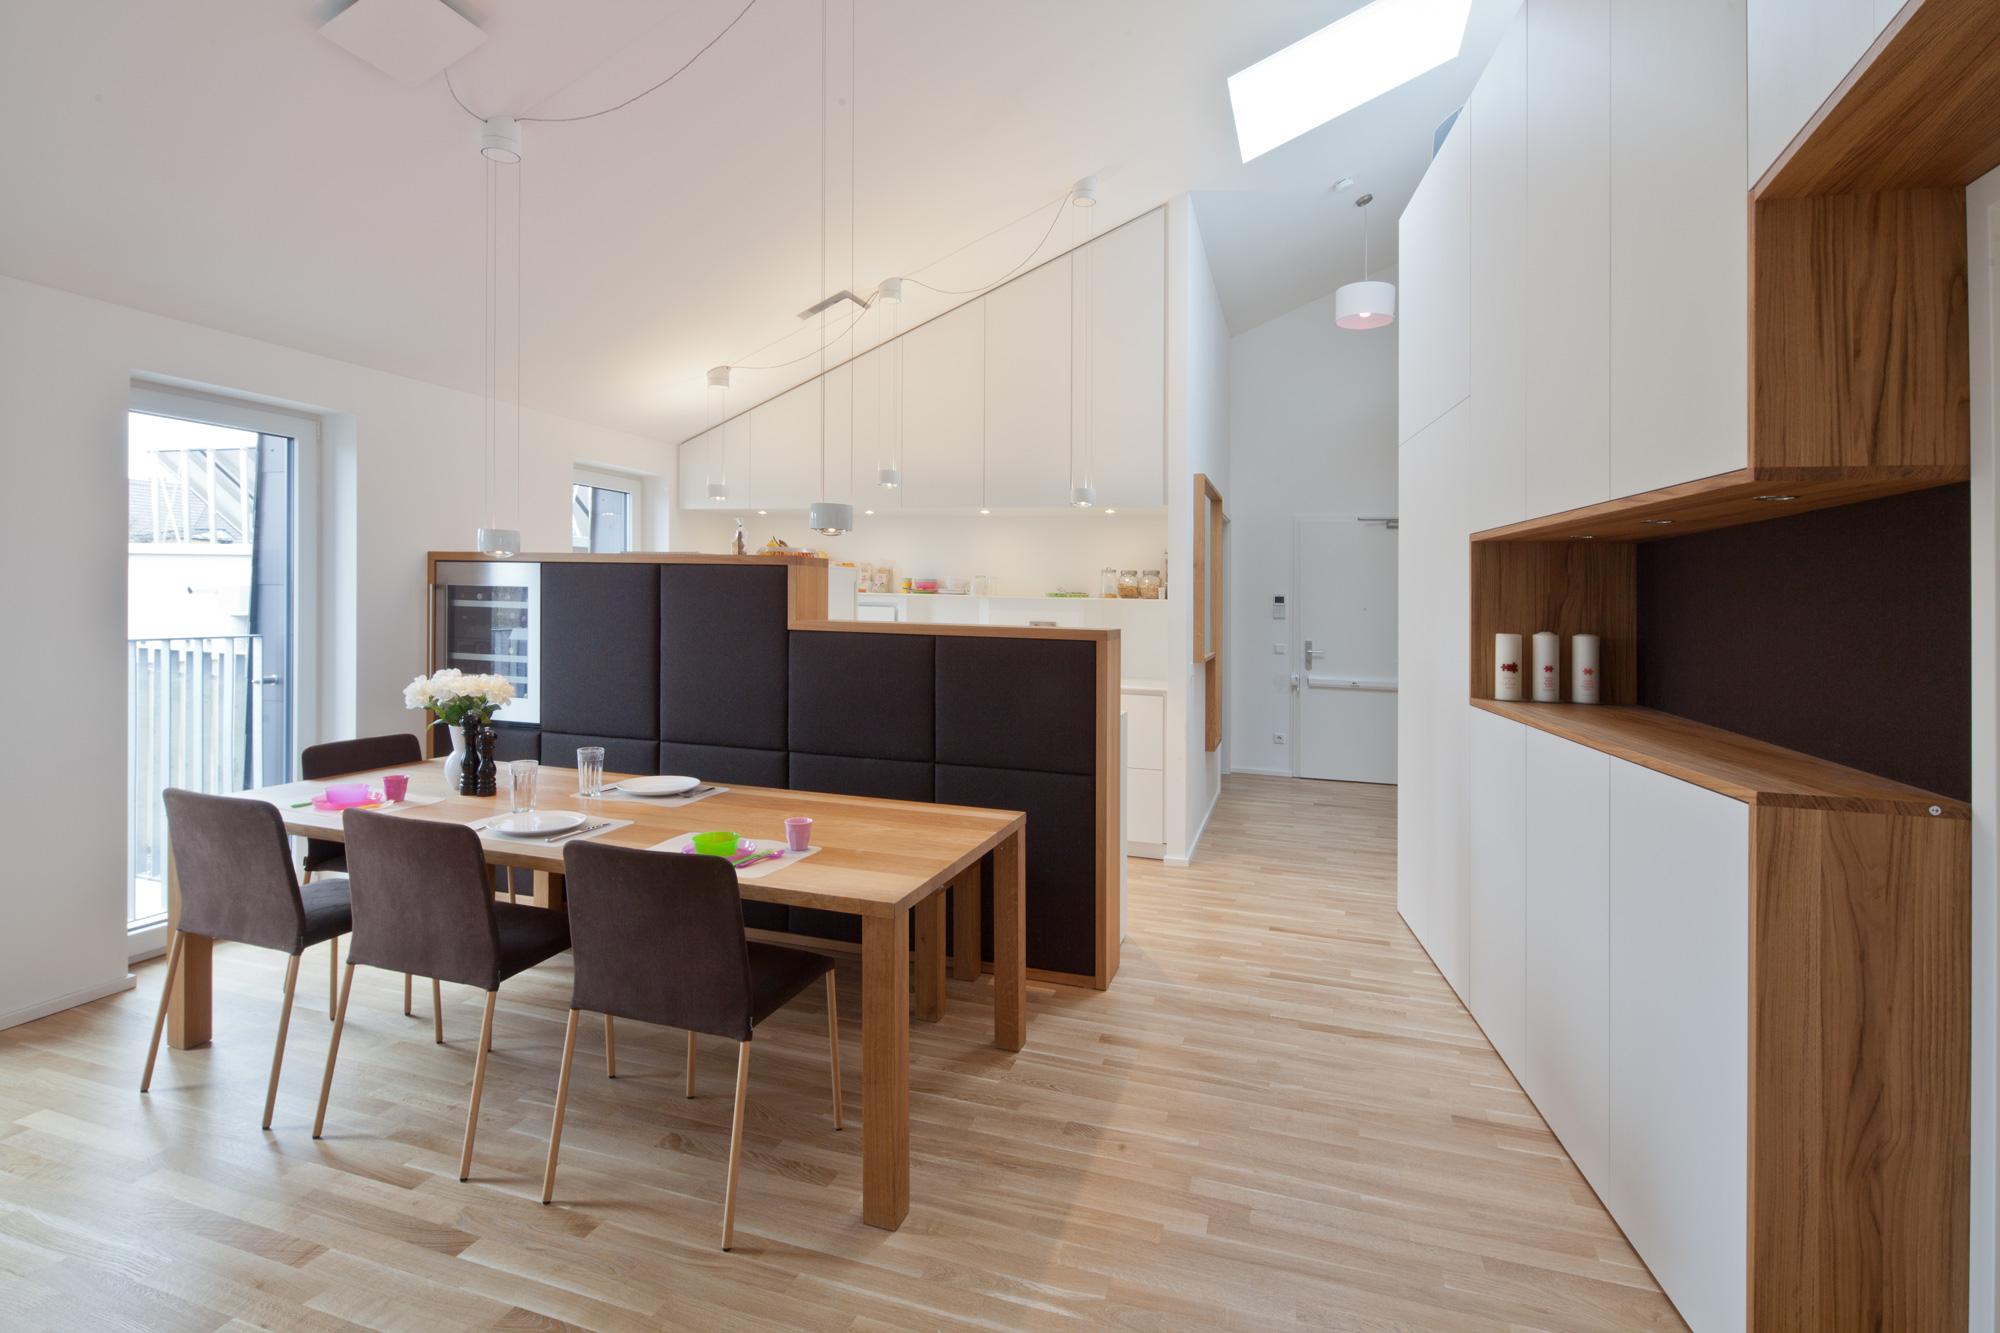 dachgeschosswohnung schwabing lignum arts. Black Bedroom Furniture Sets. Home Design Ideas